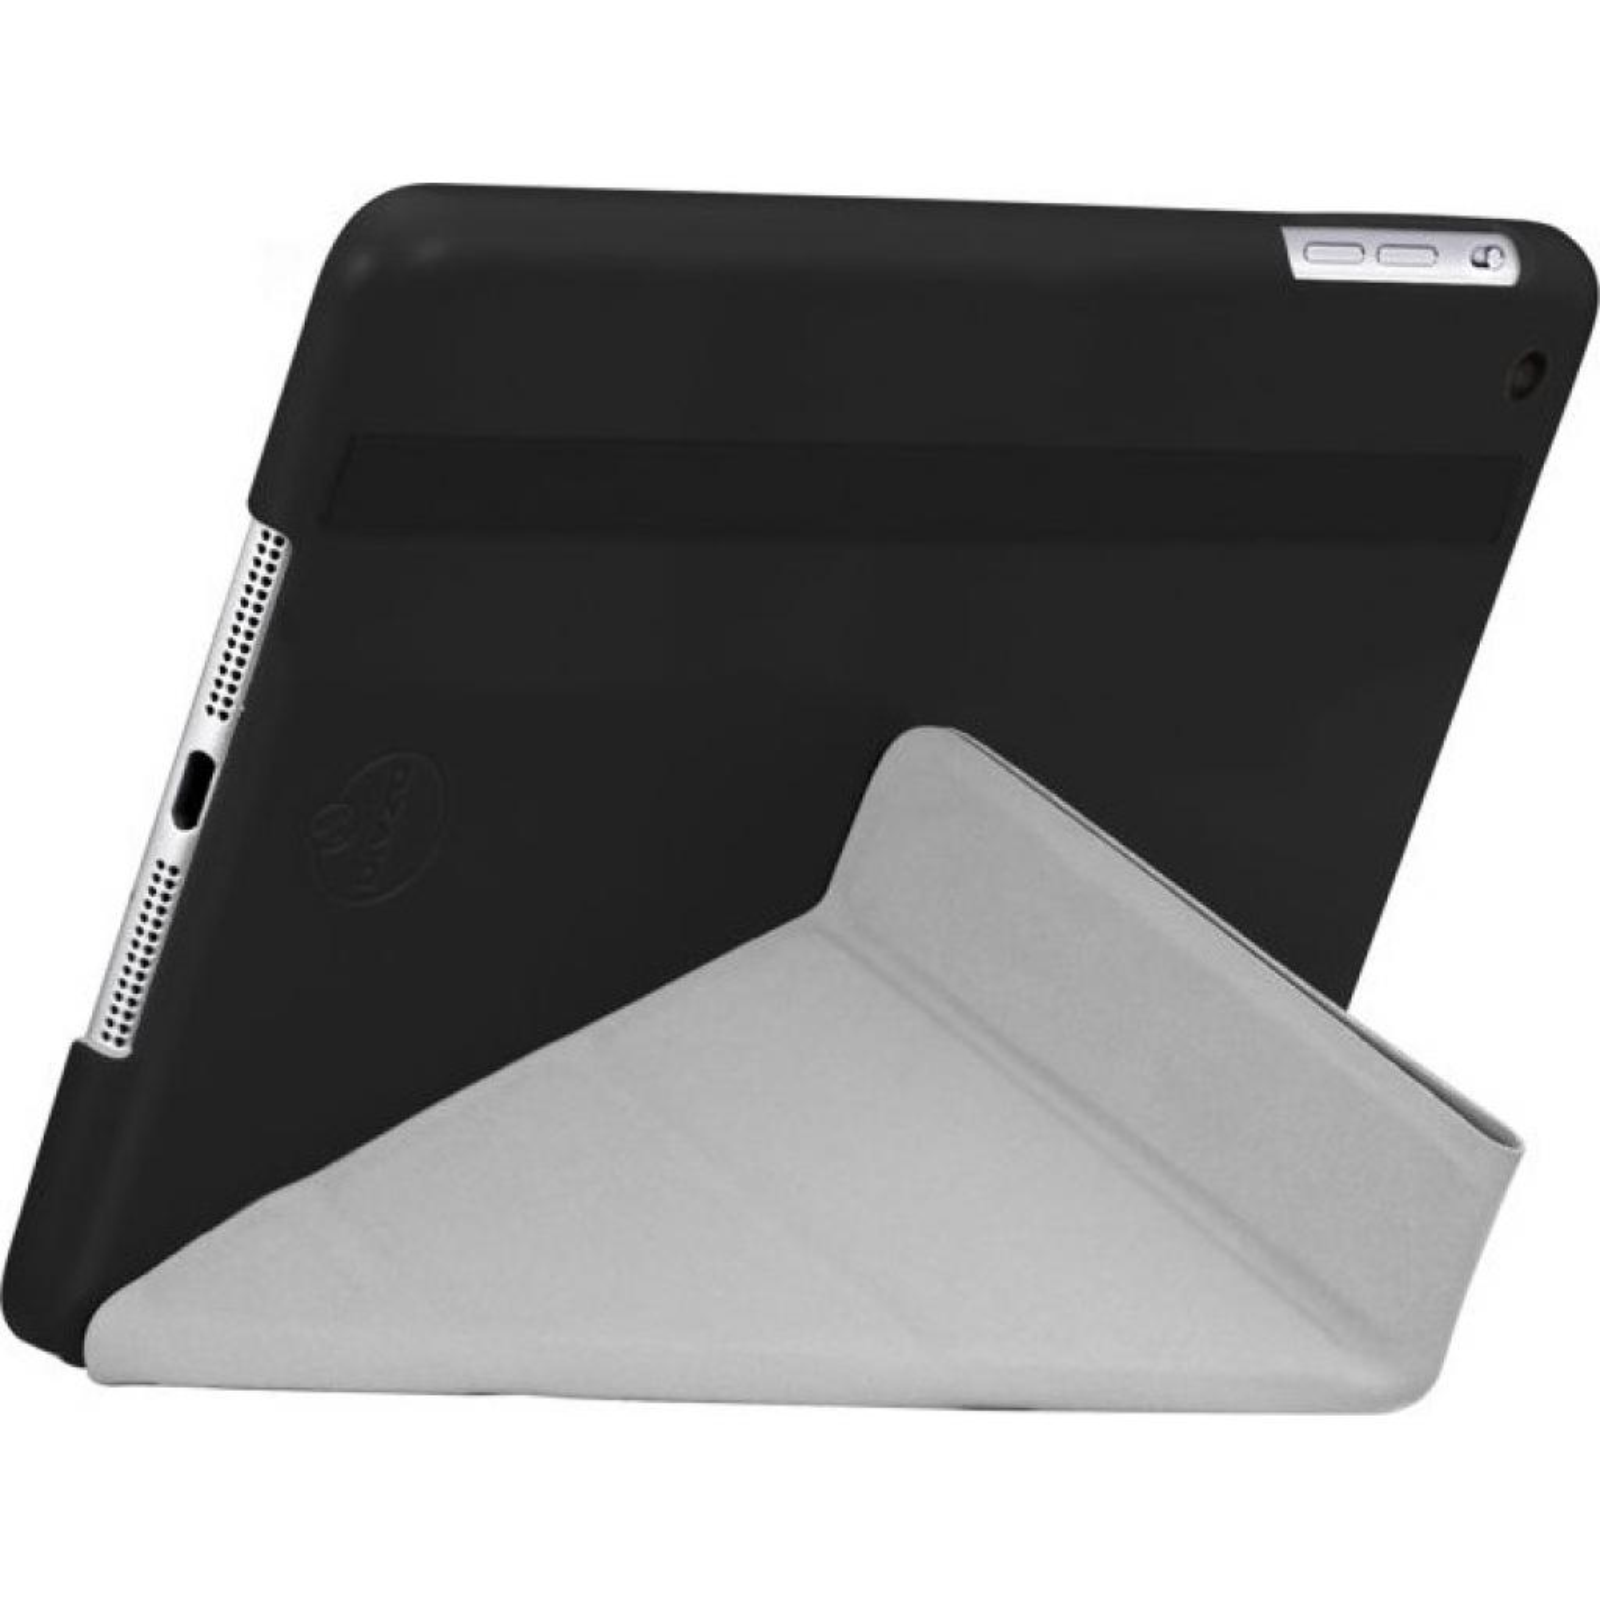 Чехол для планшета OZAKI iPad mini O!coat Slim-Y Black (OC116BK) изображение 2